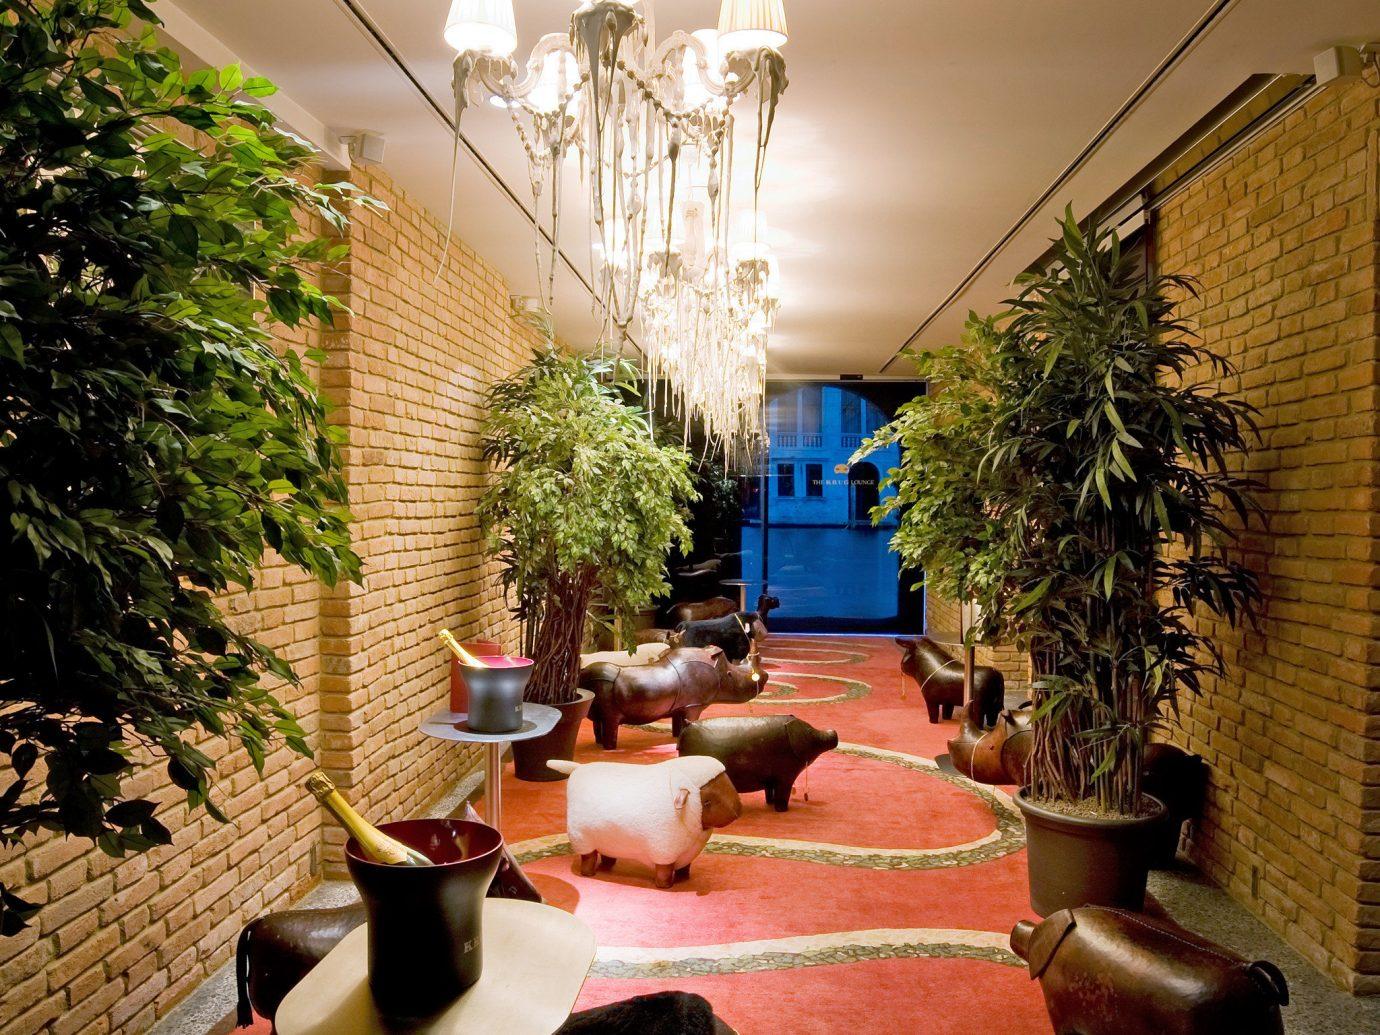 City Hip Hotels Luxury indoor room Lobby estate restaurant home interior design backyard lighting Courtyard rug Design living room hacienda flower furniture